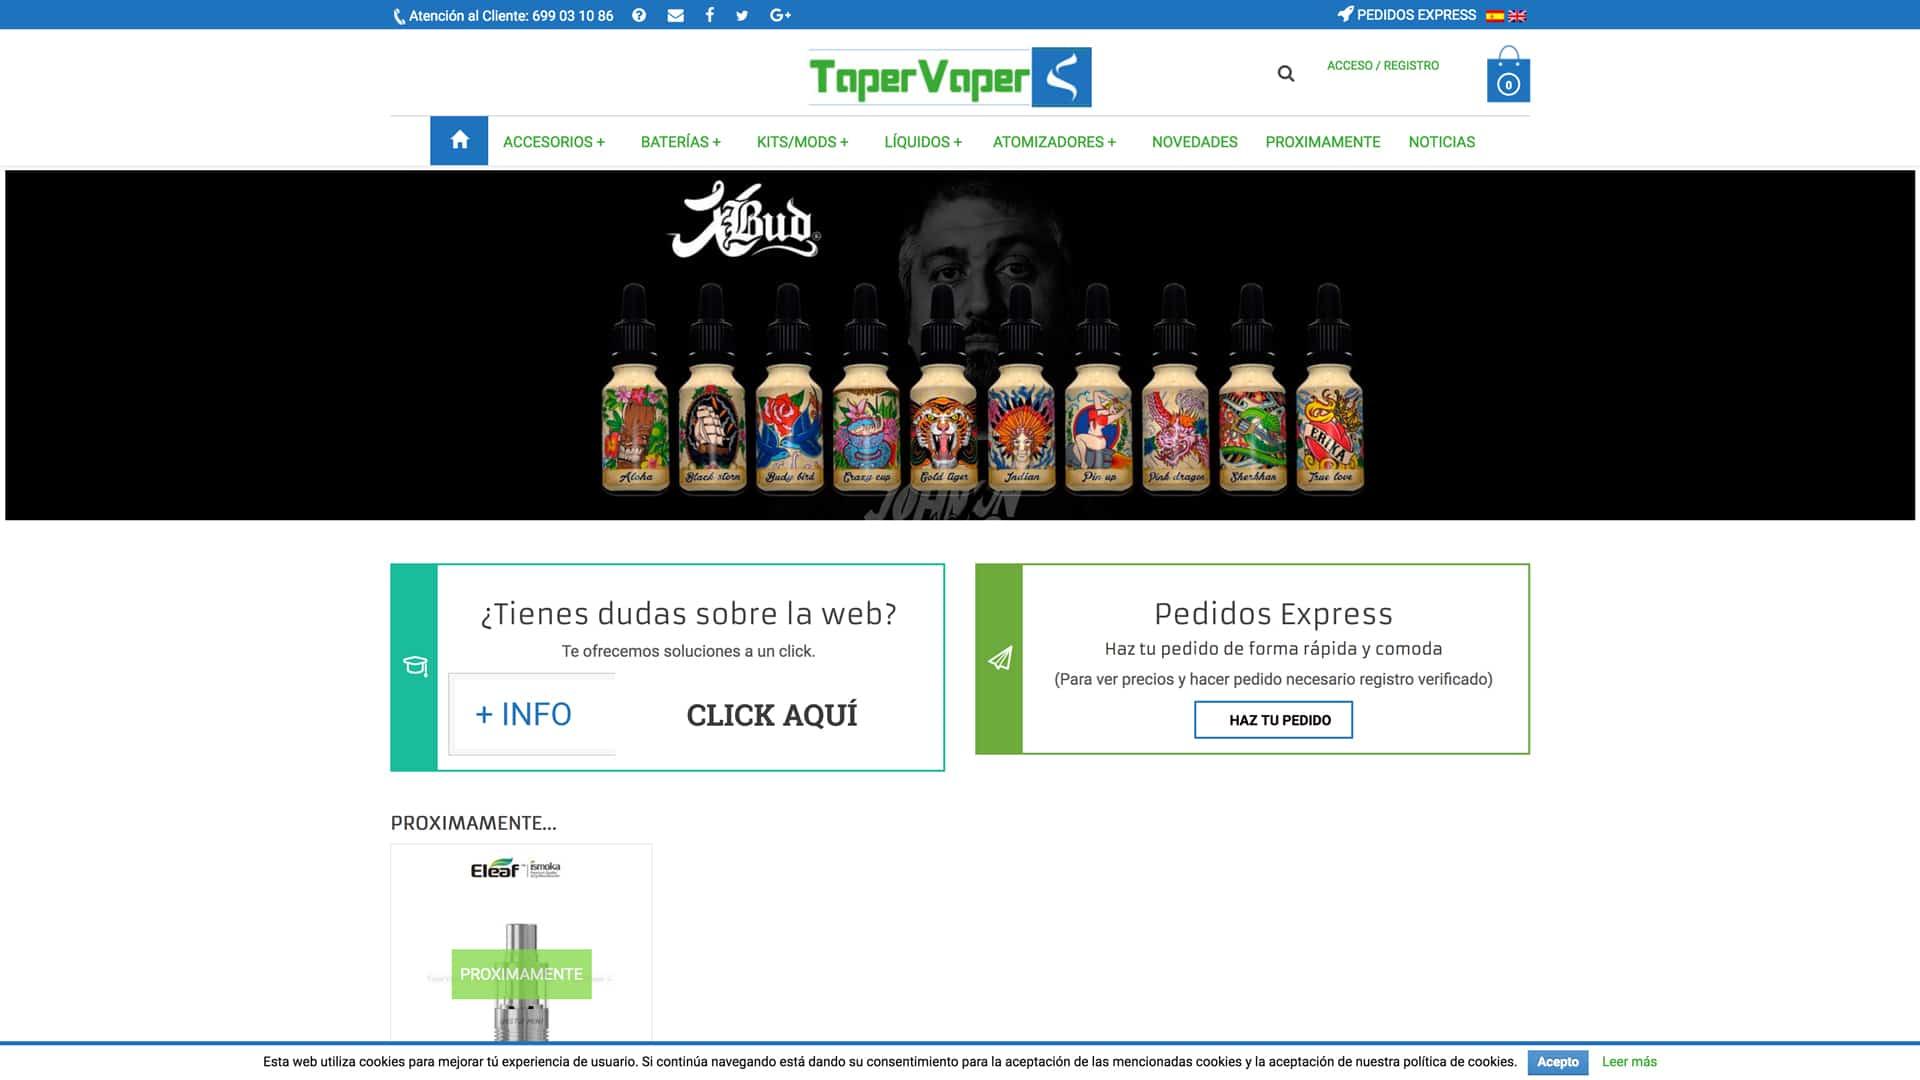 TaperVaper